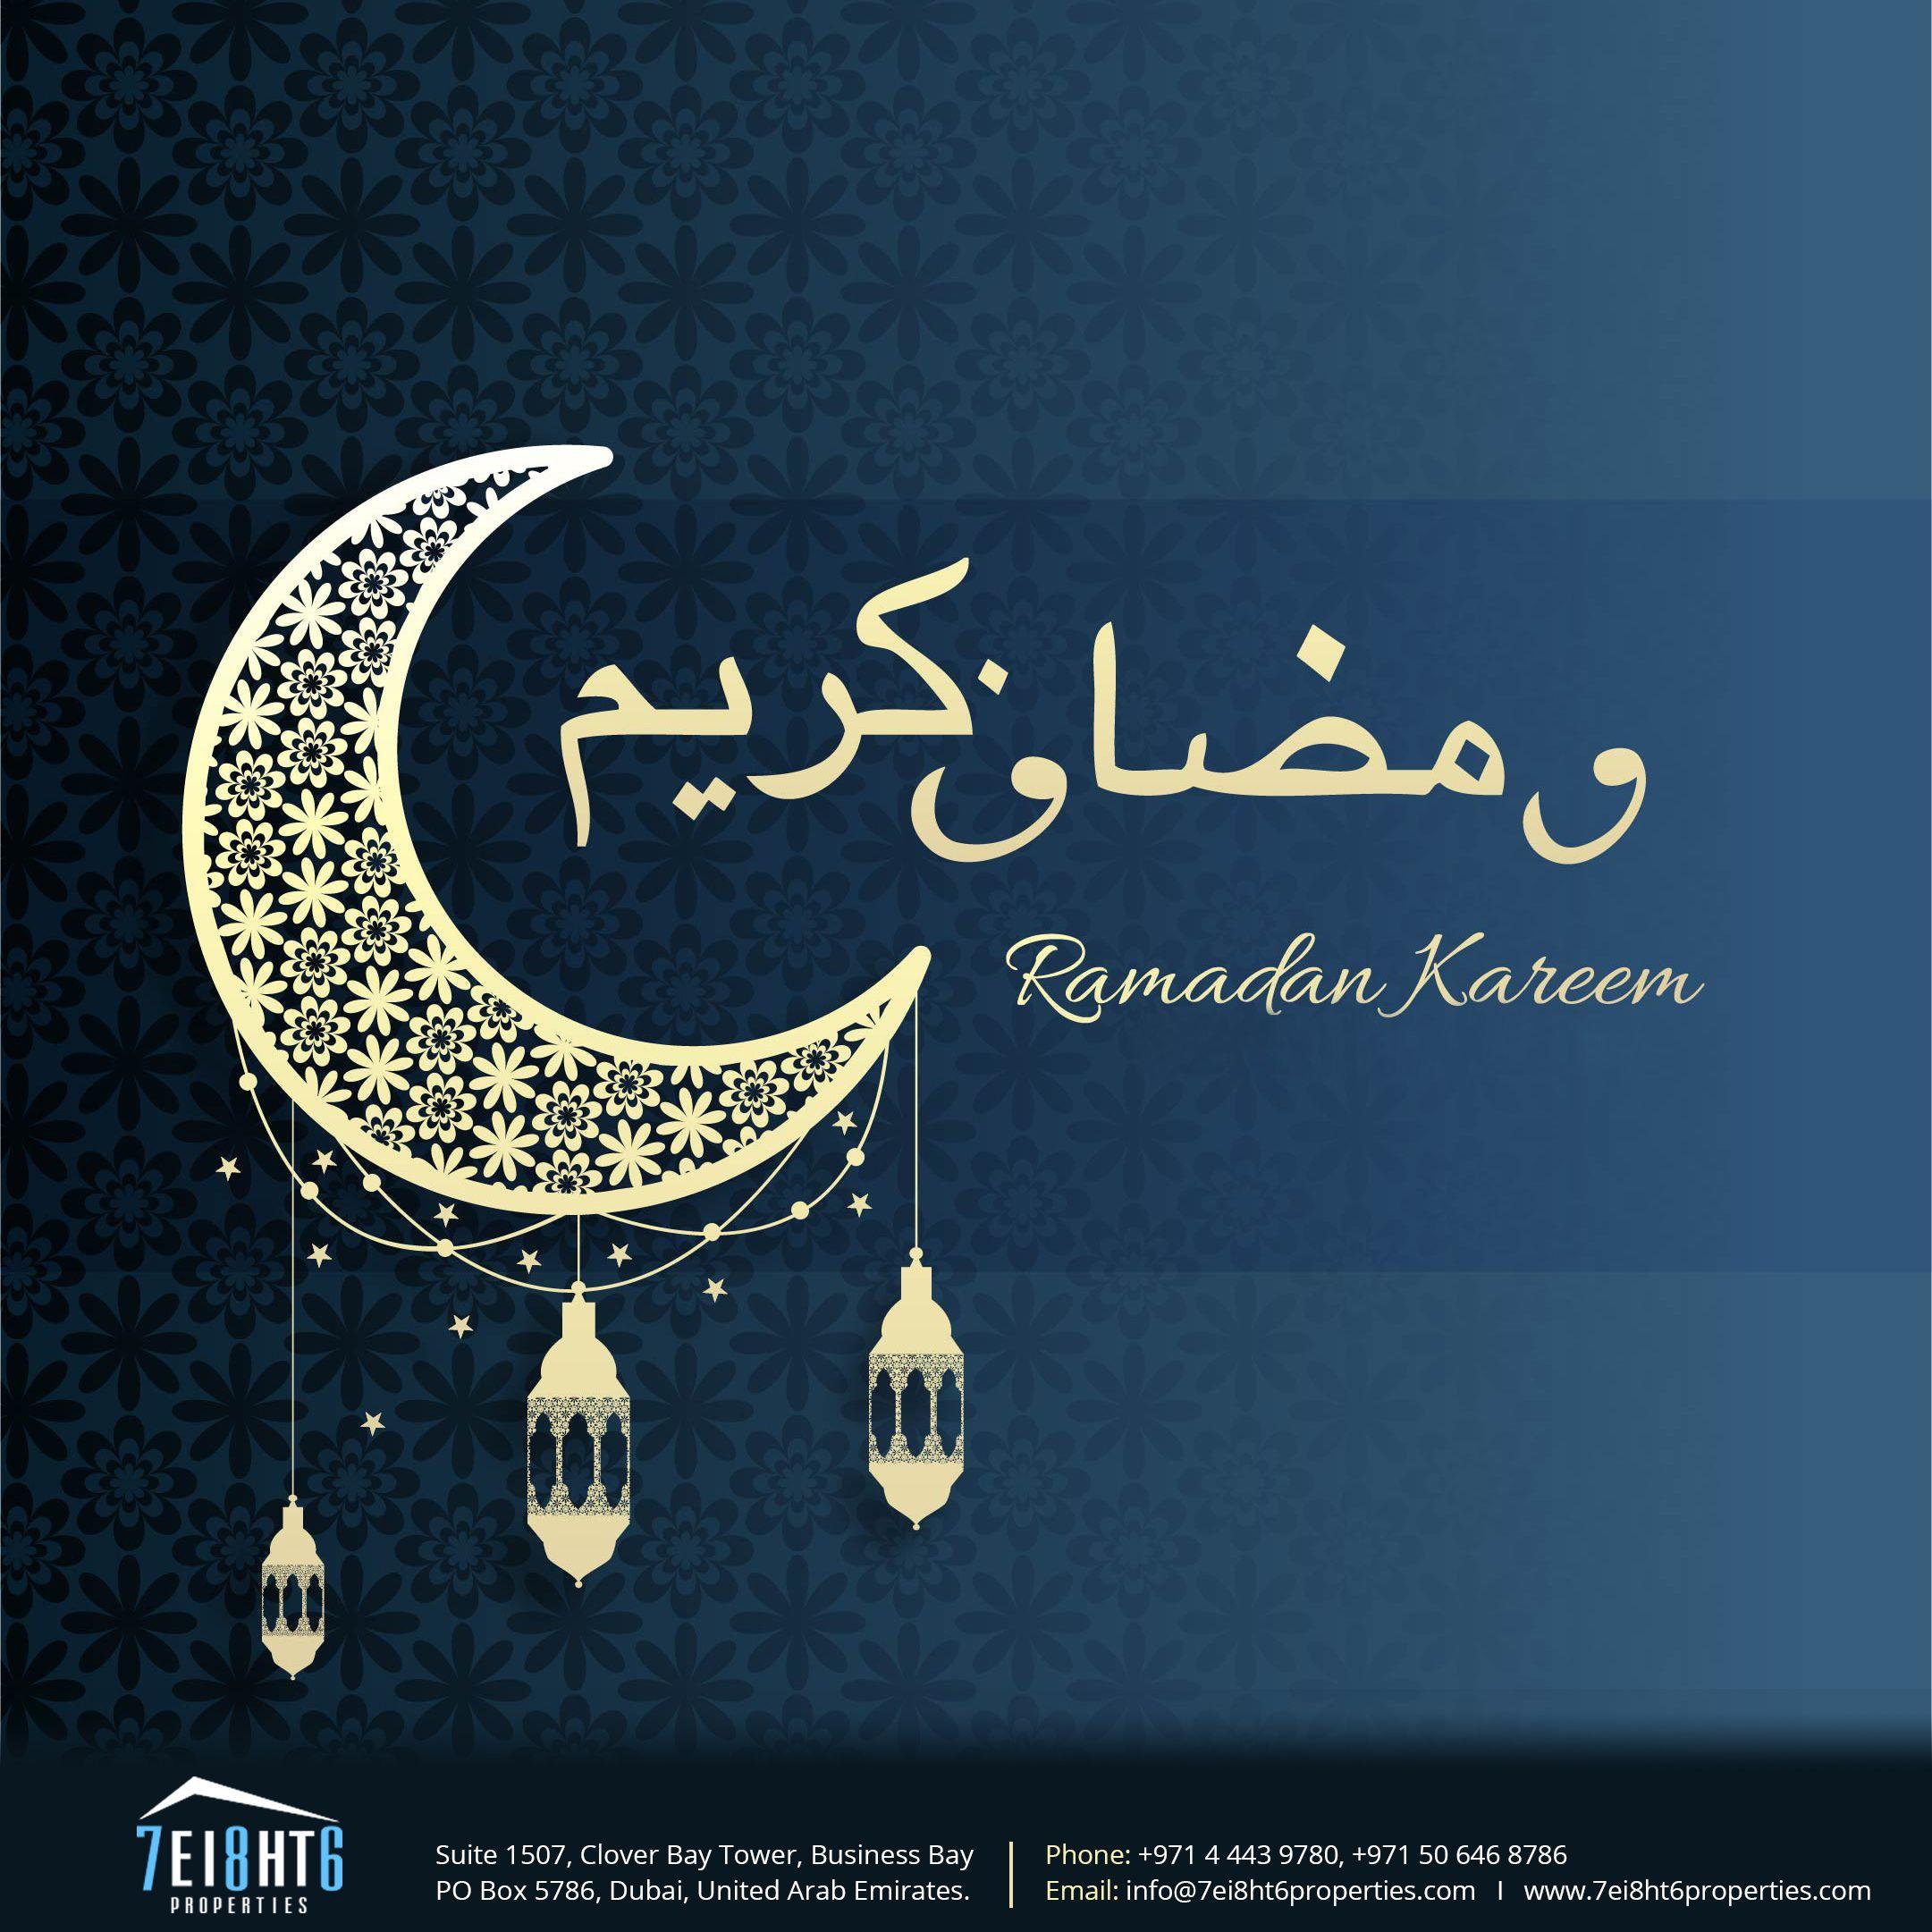 Eid Mubarak Greetings Eid Mubarak Greetings Pinterest Ramadan